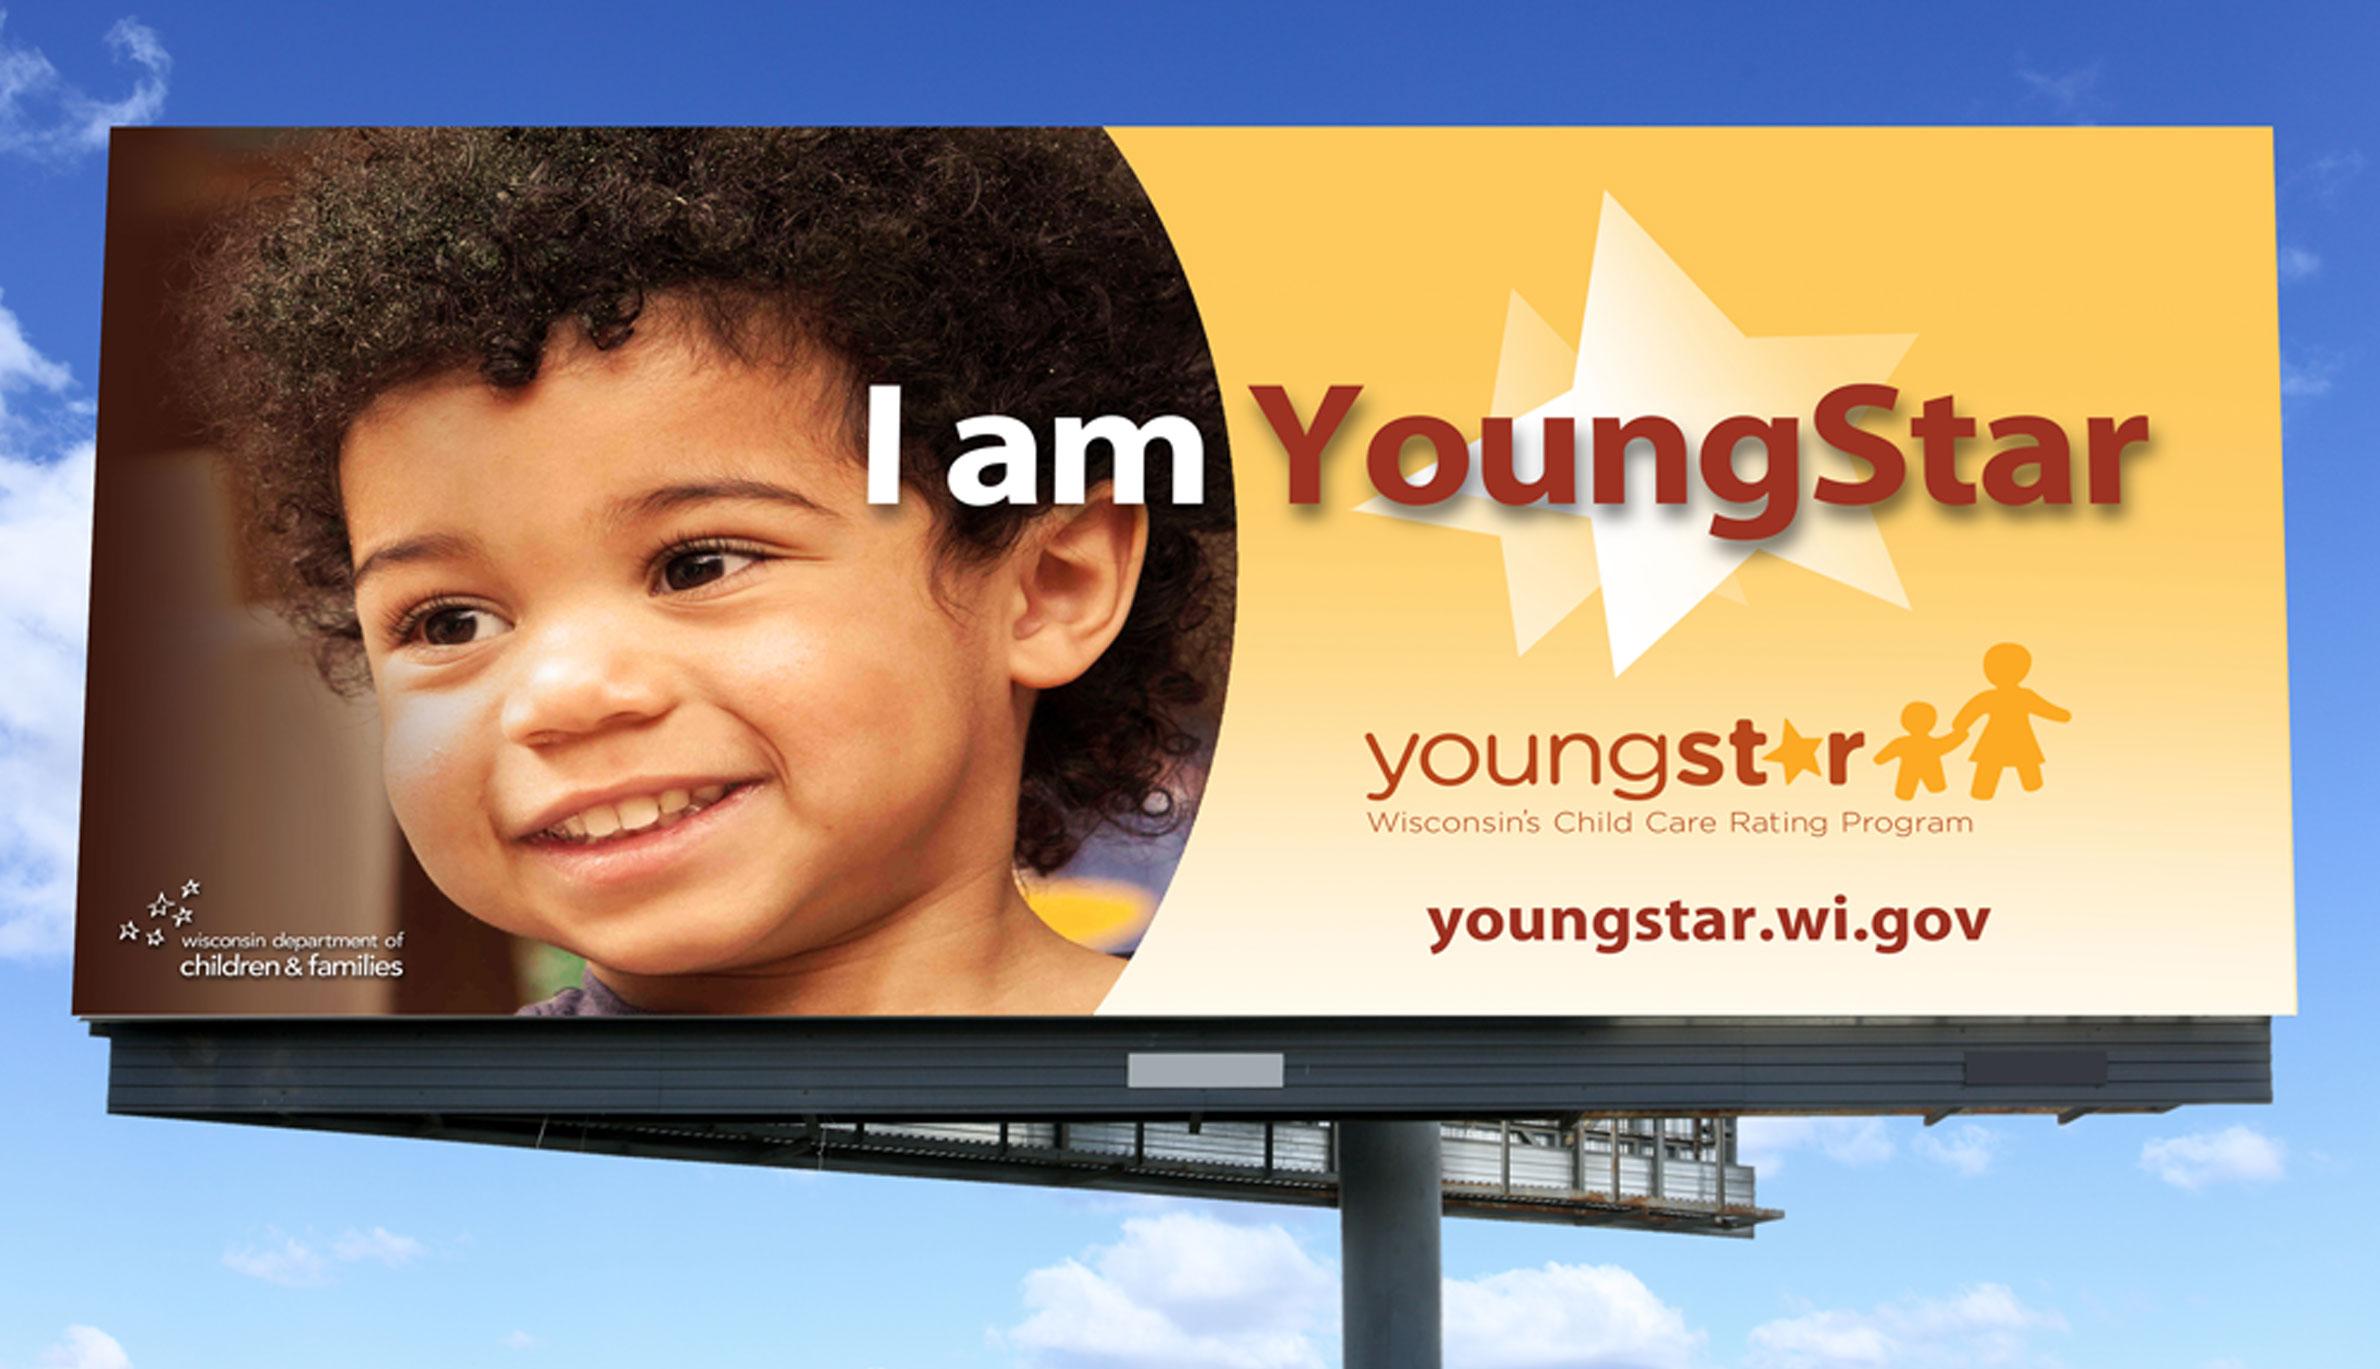 YoungStar Billboard Mockup